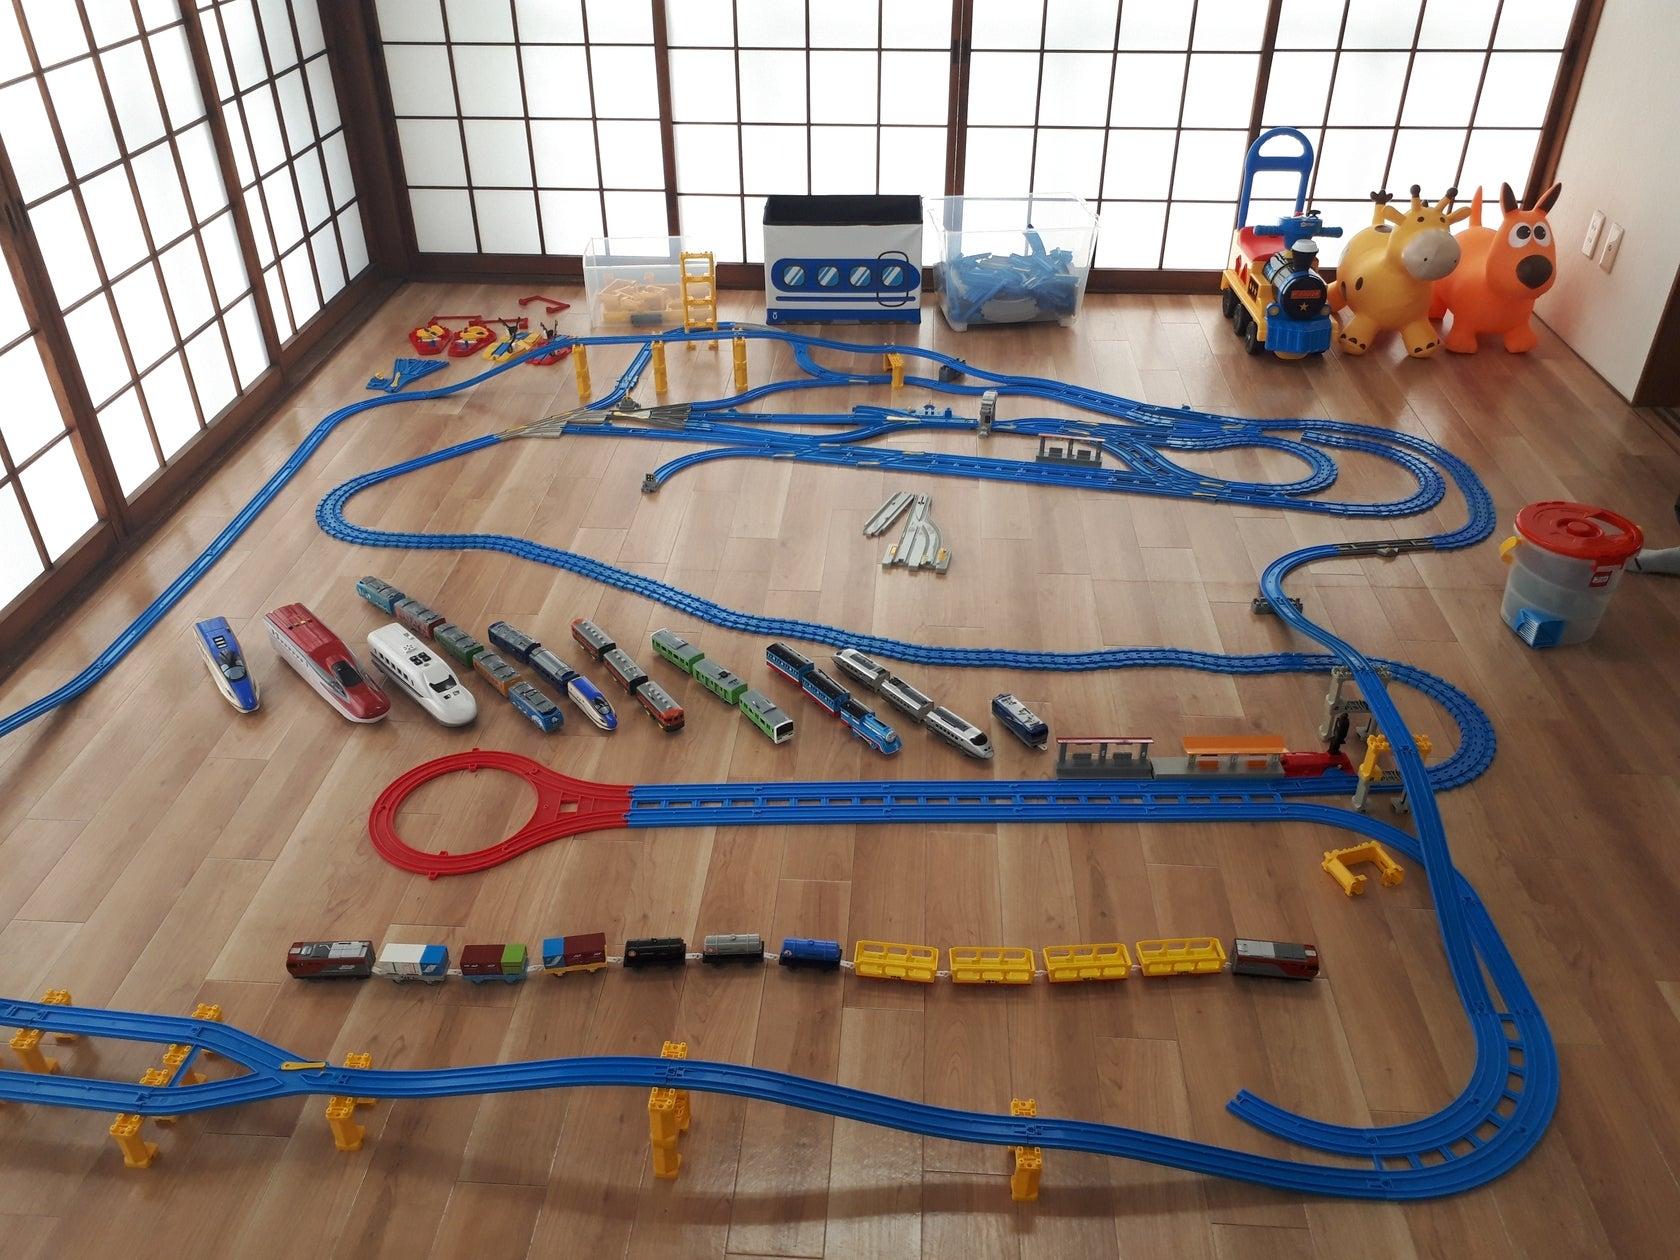 『Tool』未就学児向けおもちゃ多数・広いベランダも有り リビング14畳・キッチン6畳【2018.4月改装】 の写真